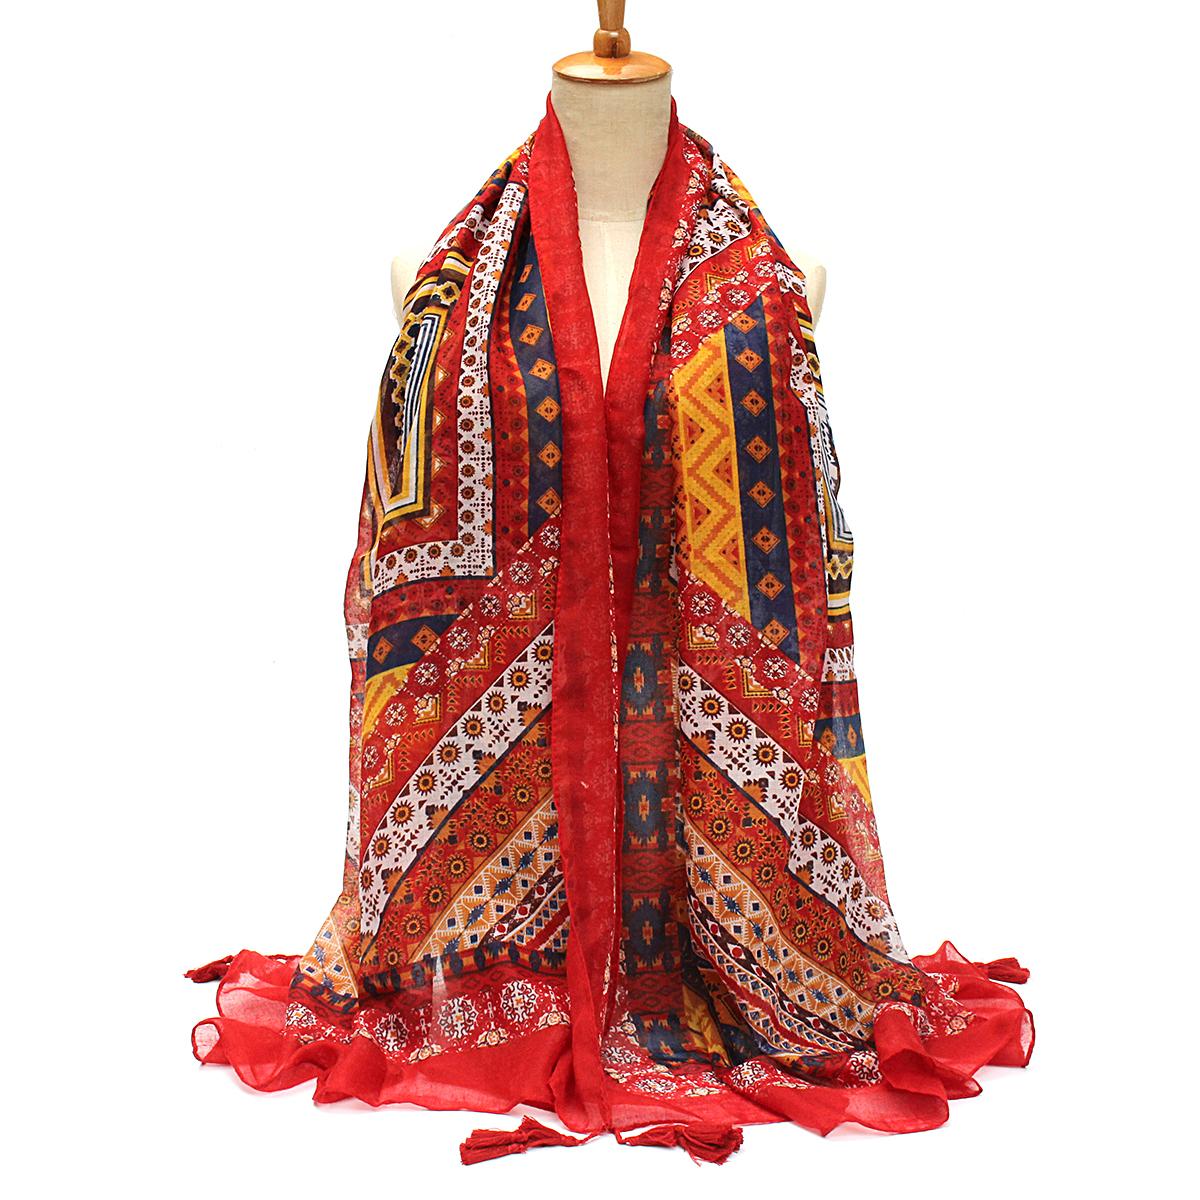 Women Ladies Bohemian Cotton Linen Scarves Folk Vintage Paisley Tassel Stole Shawl Wrap Scarf